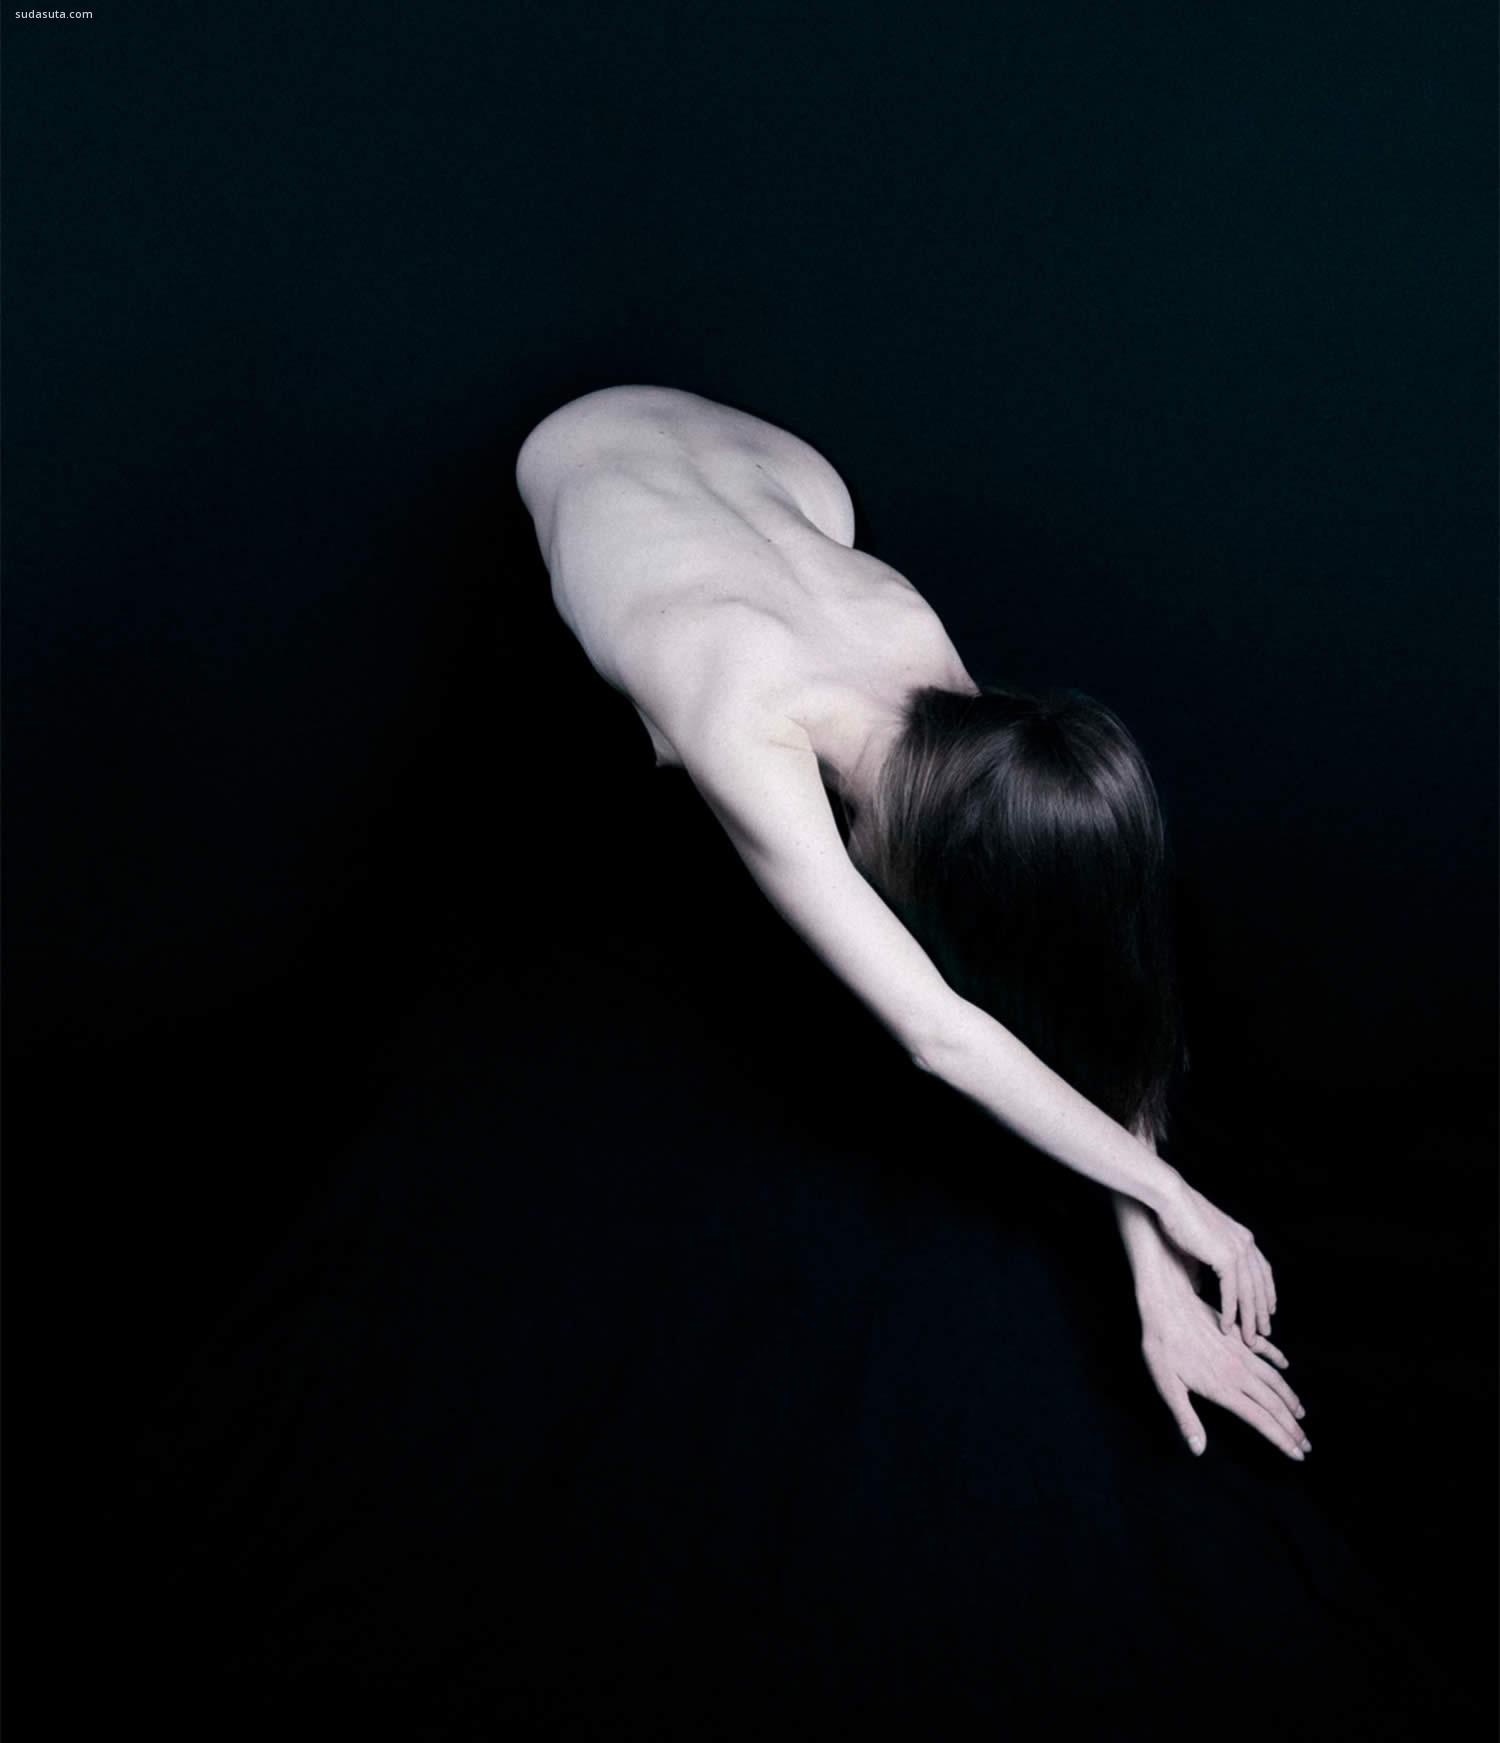 Thibault Delhom 超现实主义摄影欣赏《DON'T SPEAK》